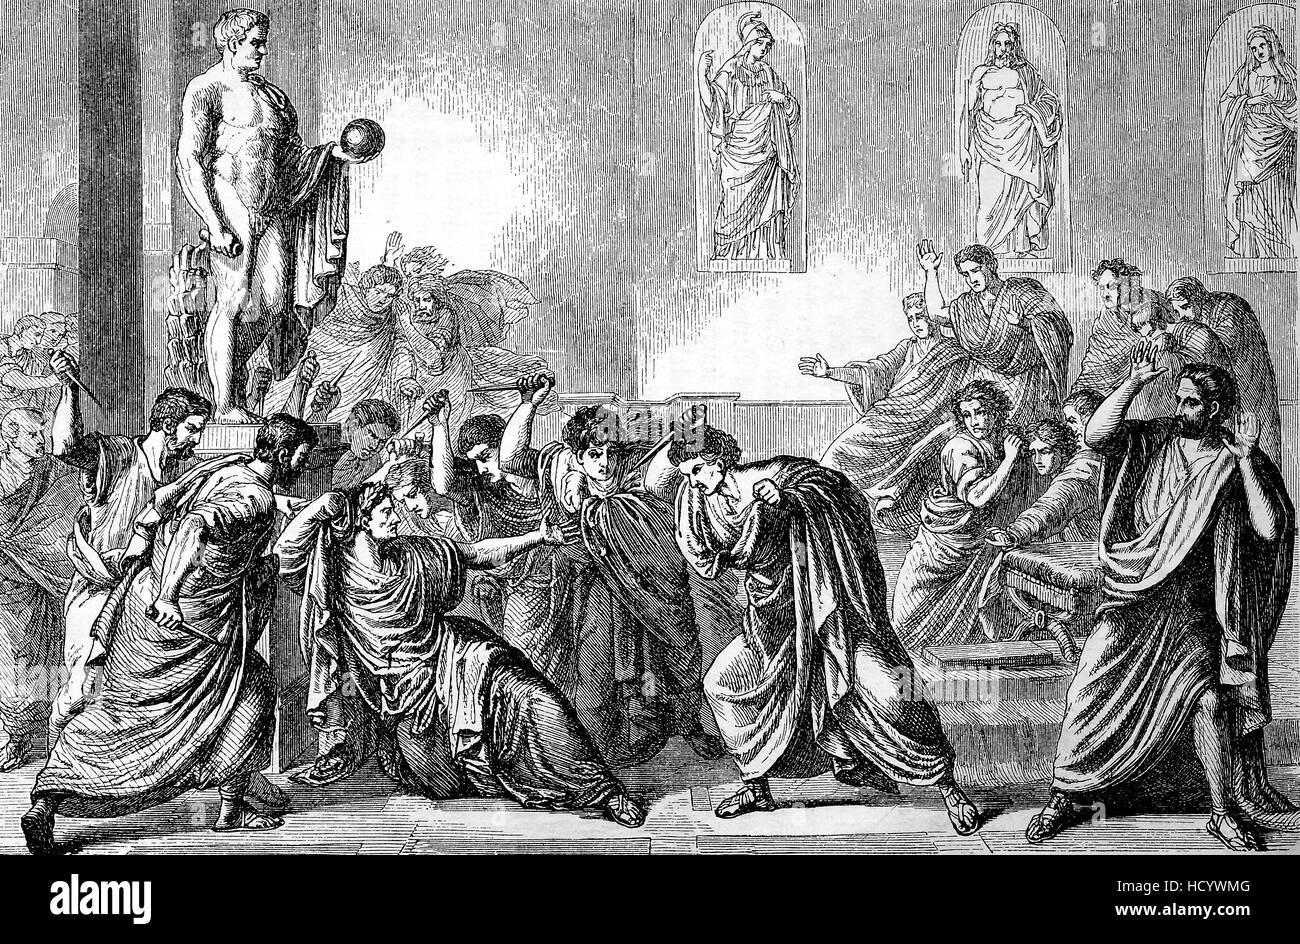 The Death of Caesar, 44 BC, Gaius Julius Caesa, Rome, the story of the ancient Rome, roman Empire, Italy - Stock Image